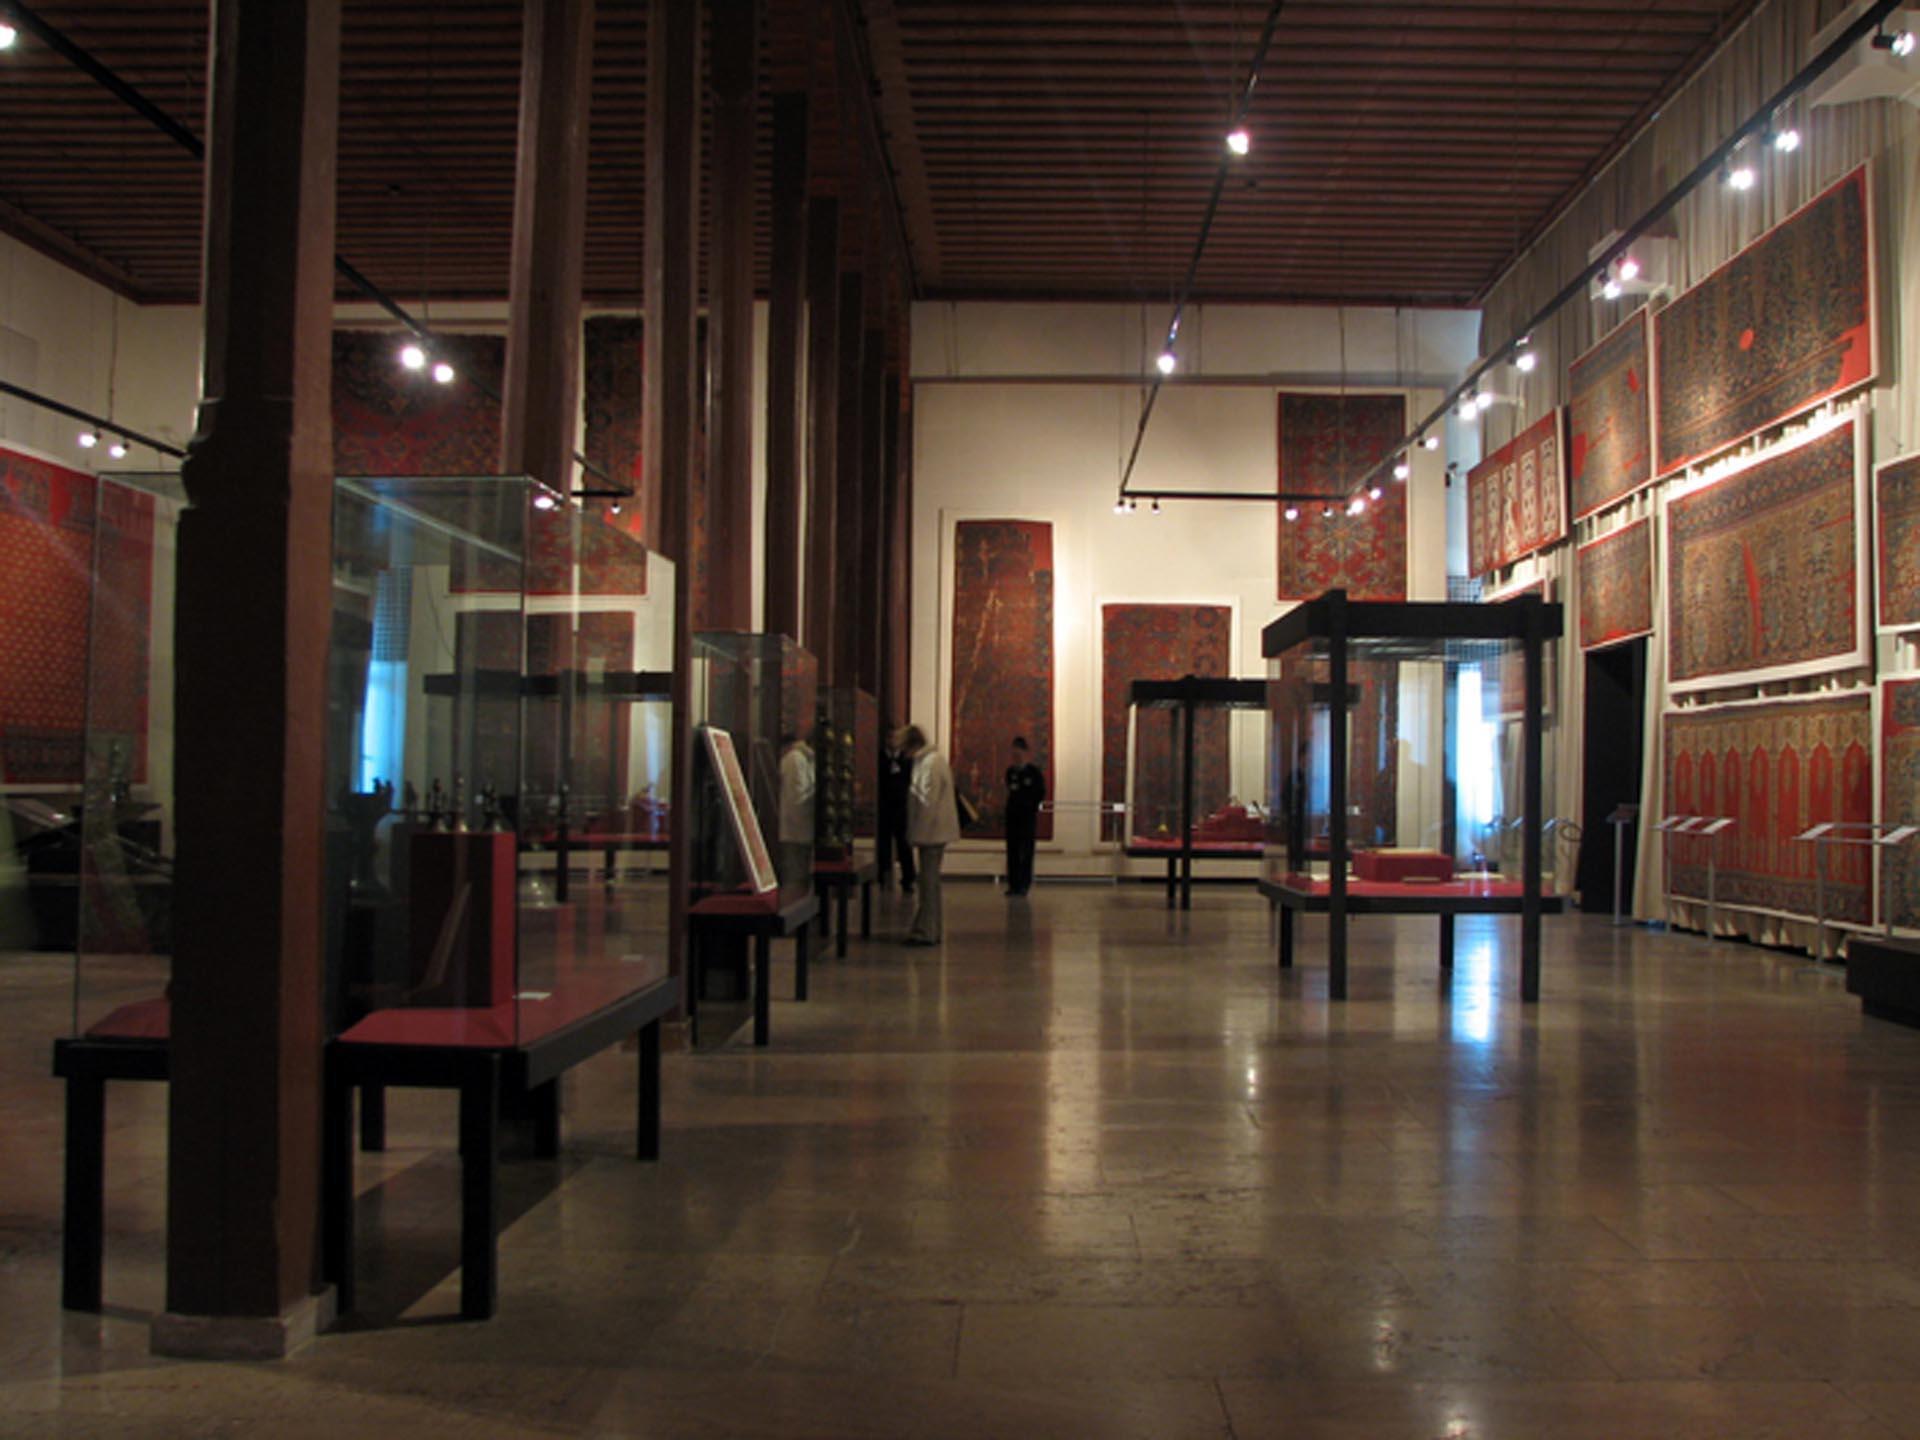 Turkish and Islamic Arts Museum Eresin hotels sultanahmet